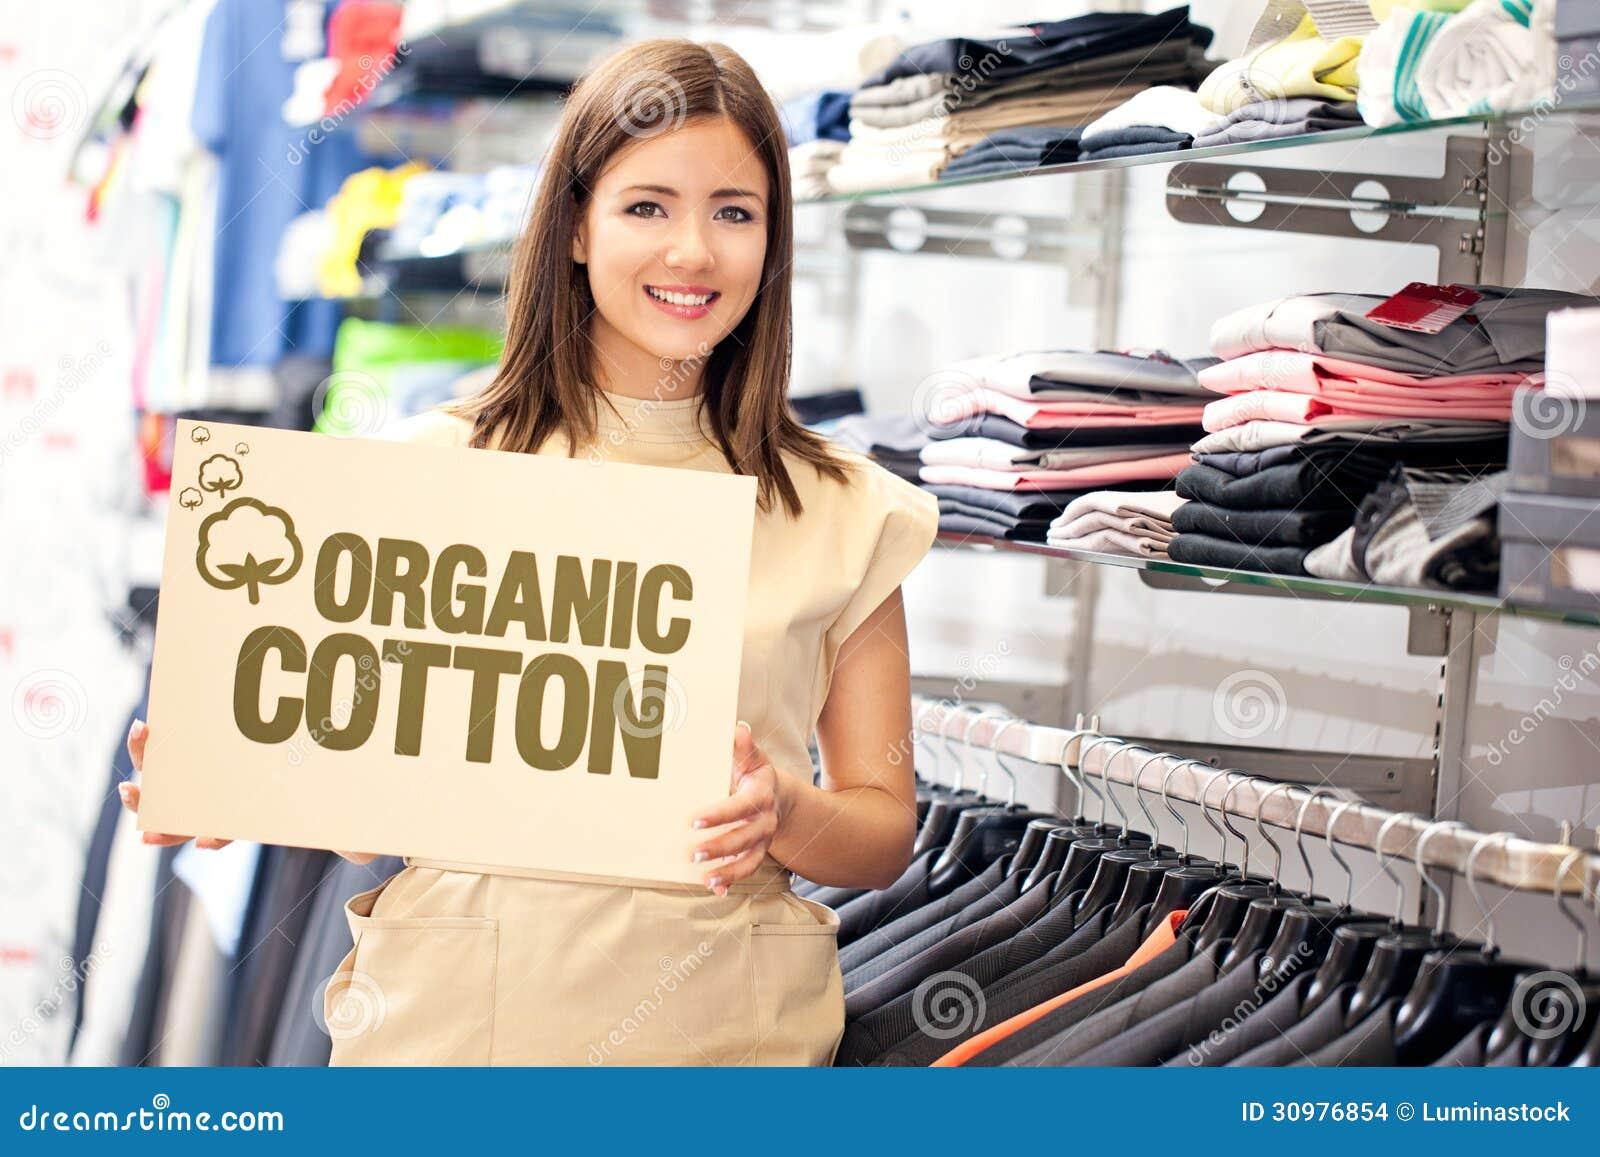 Cotton On USA, Third Street Promenade, Downtown, stores, shopping, street mall